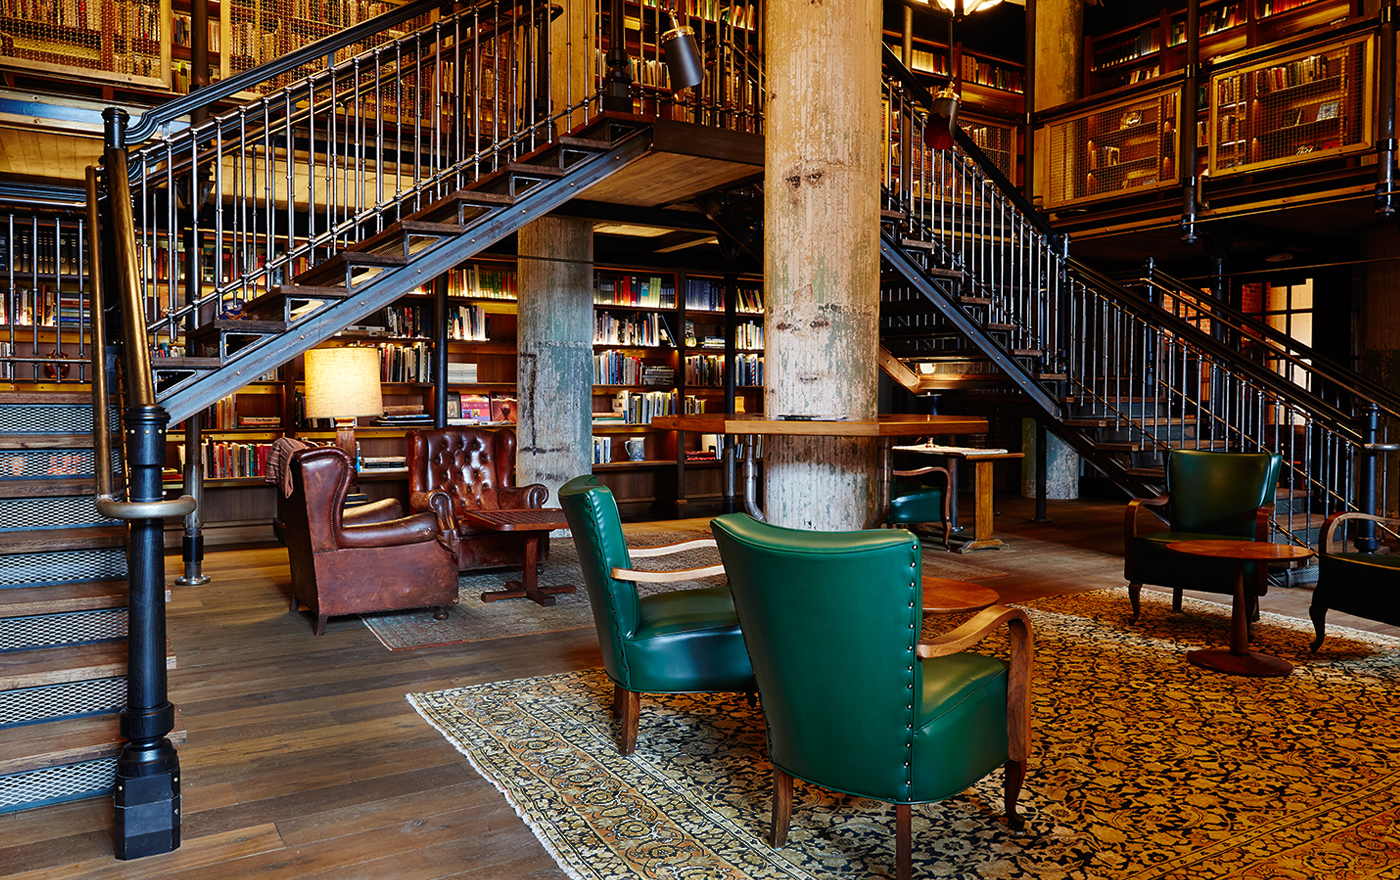 Emma-Hotel-Library-Room.jpg?mtime=20190425143019#asset:105617